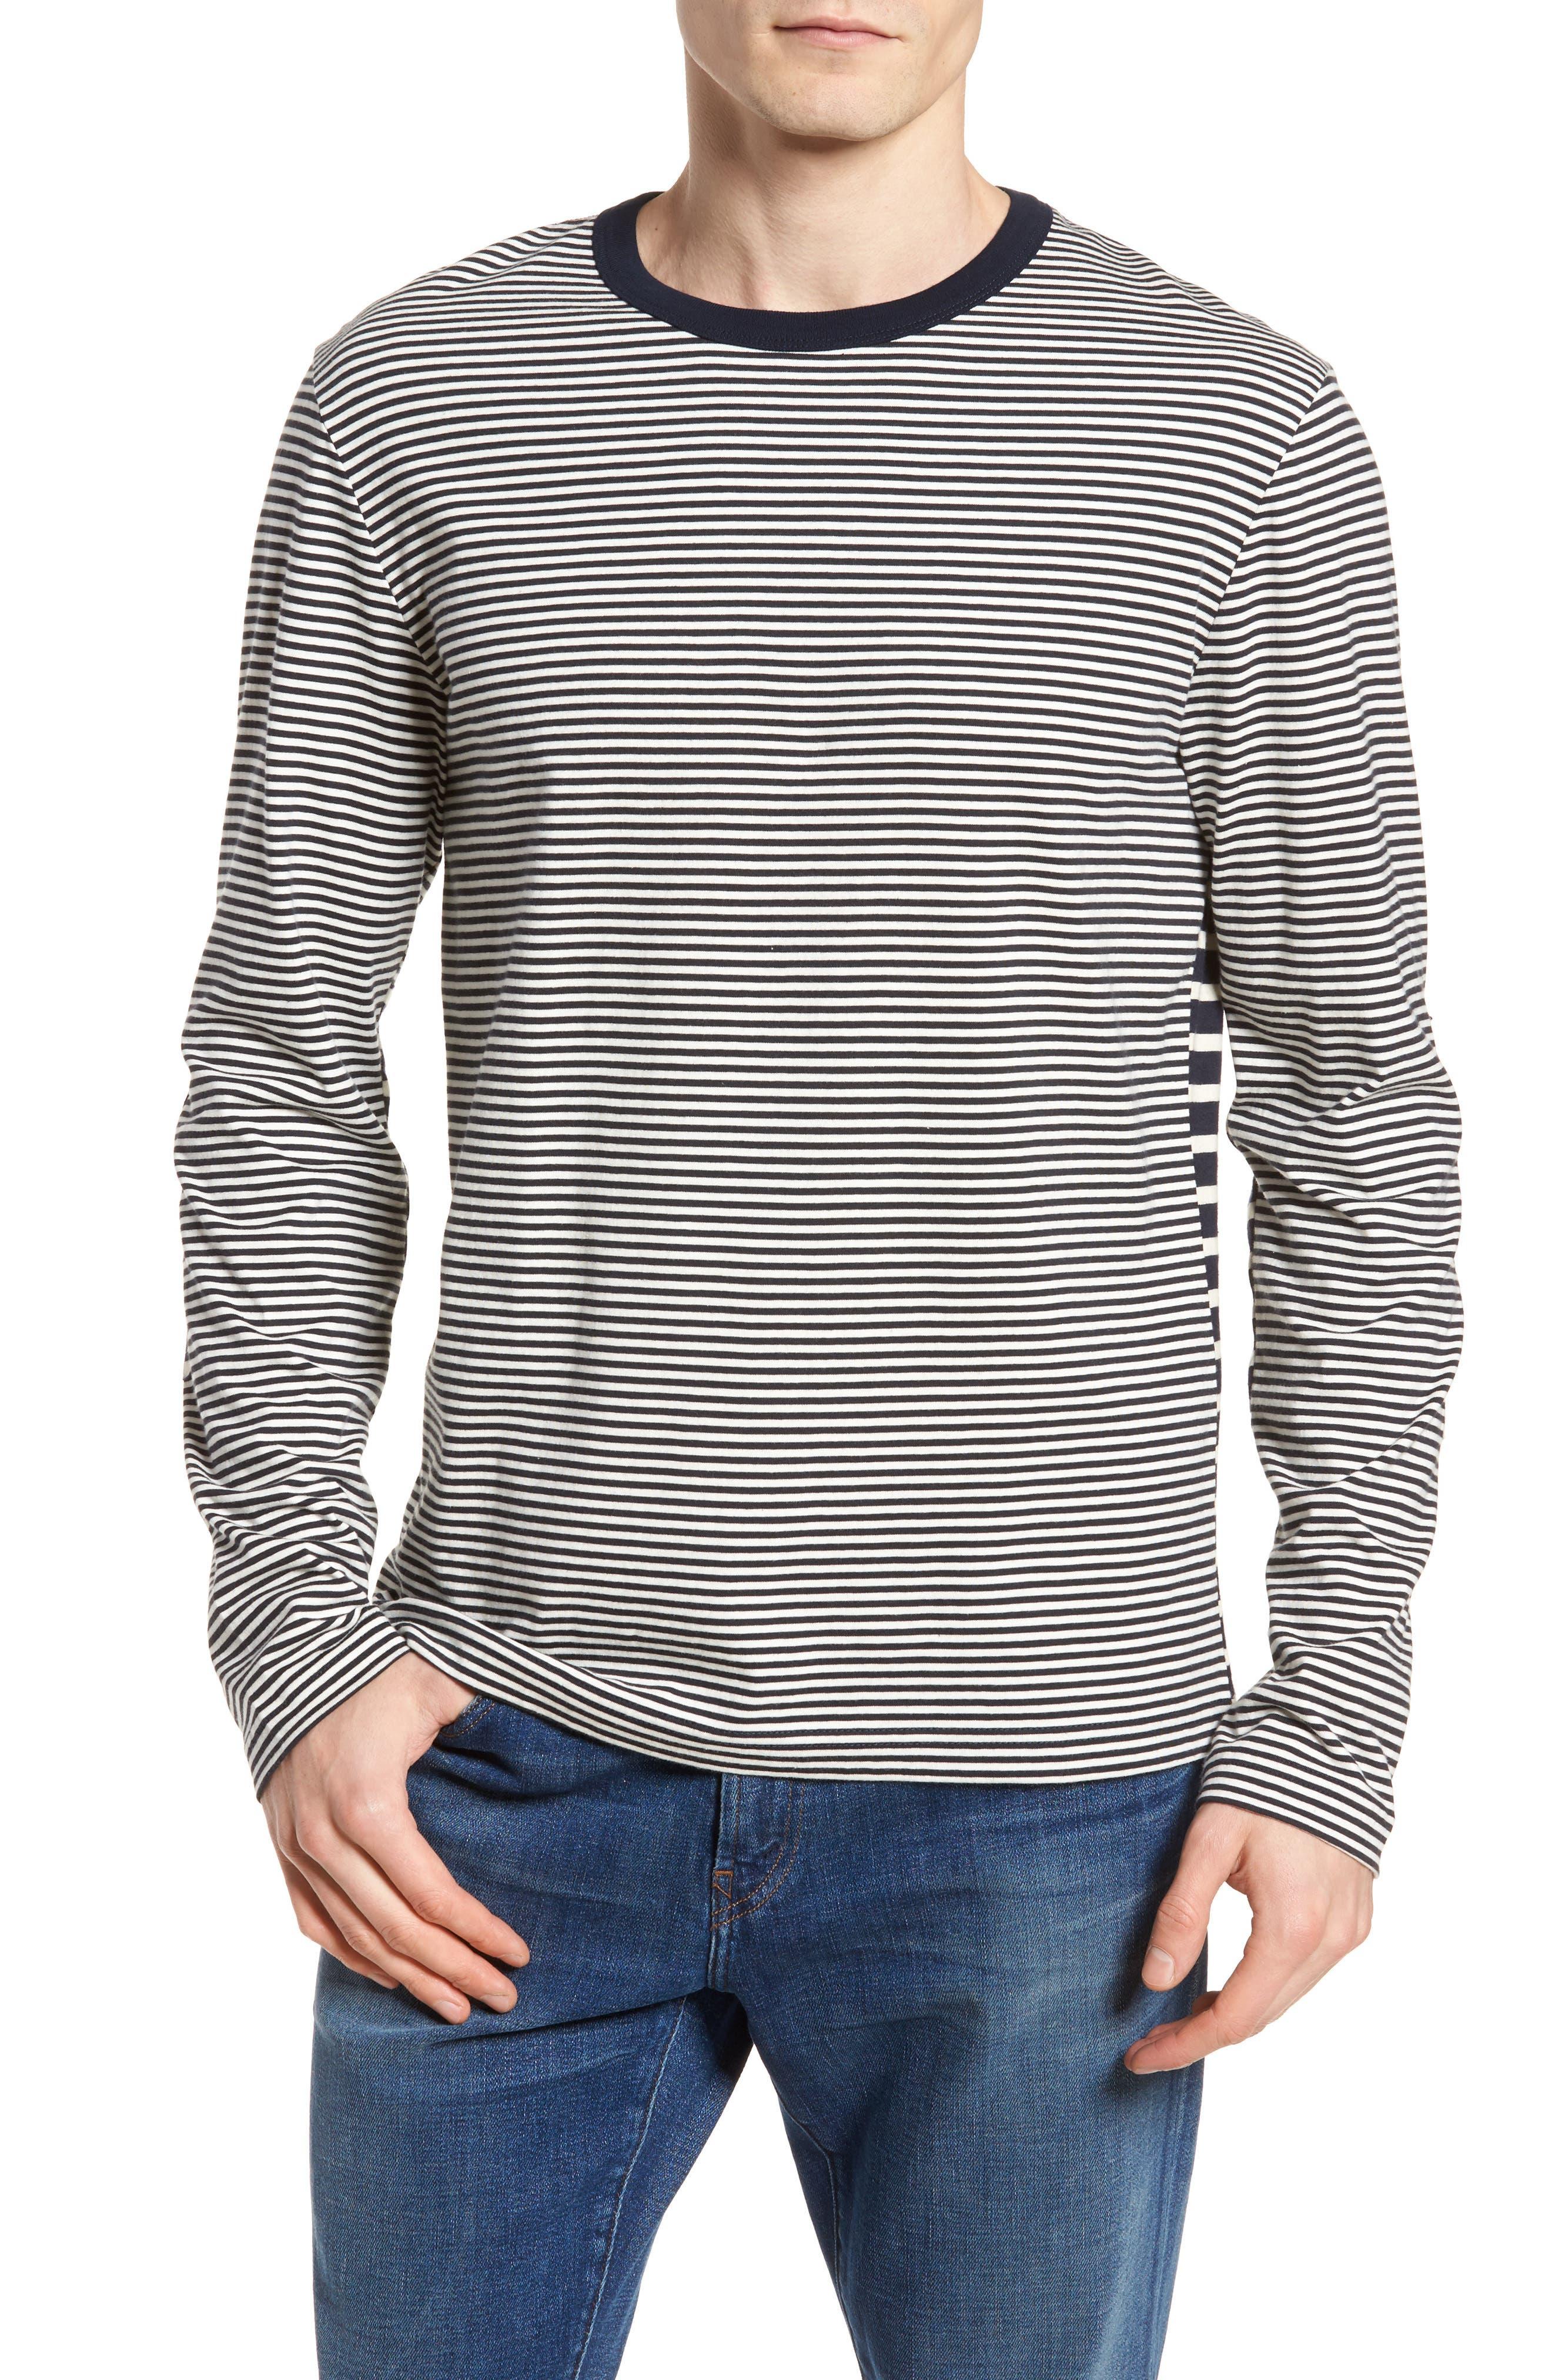 Mix Stripe Long Sleeve T-Shirt,                             Main thumbnail 1, color,                             Turtle Dove/ Marine Blue